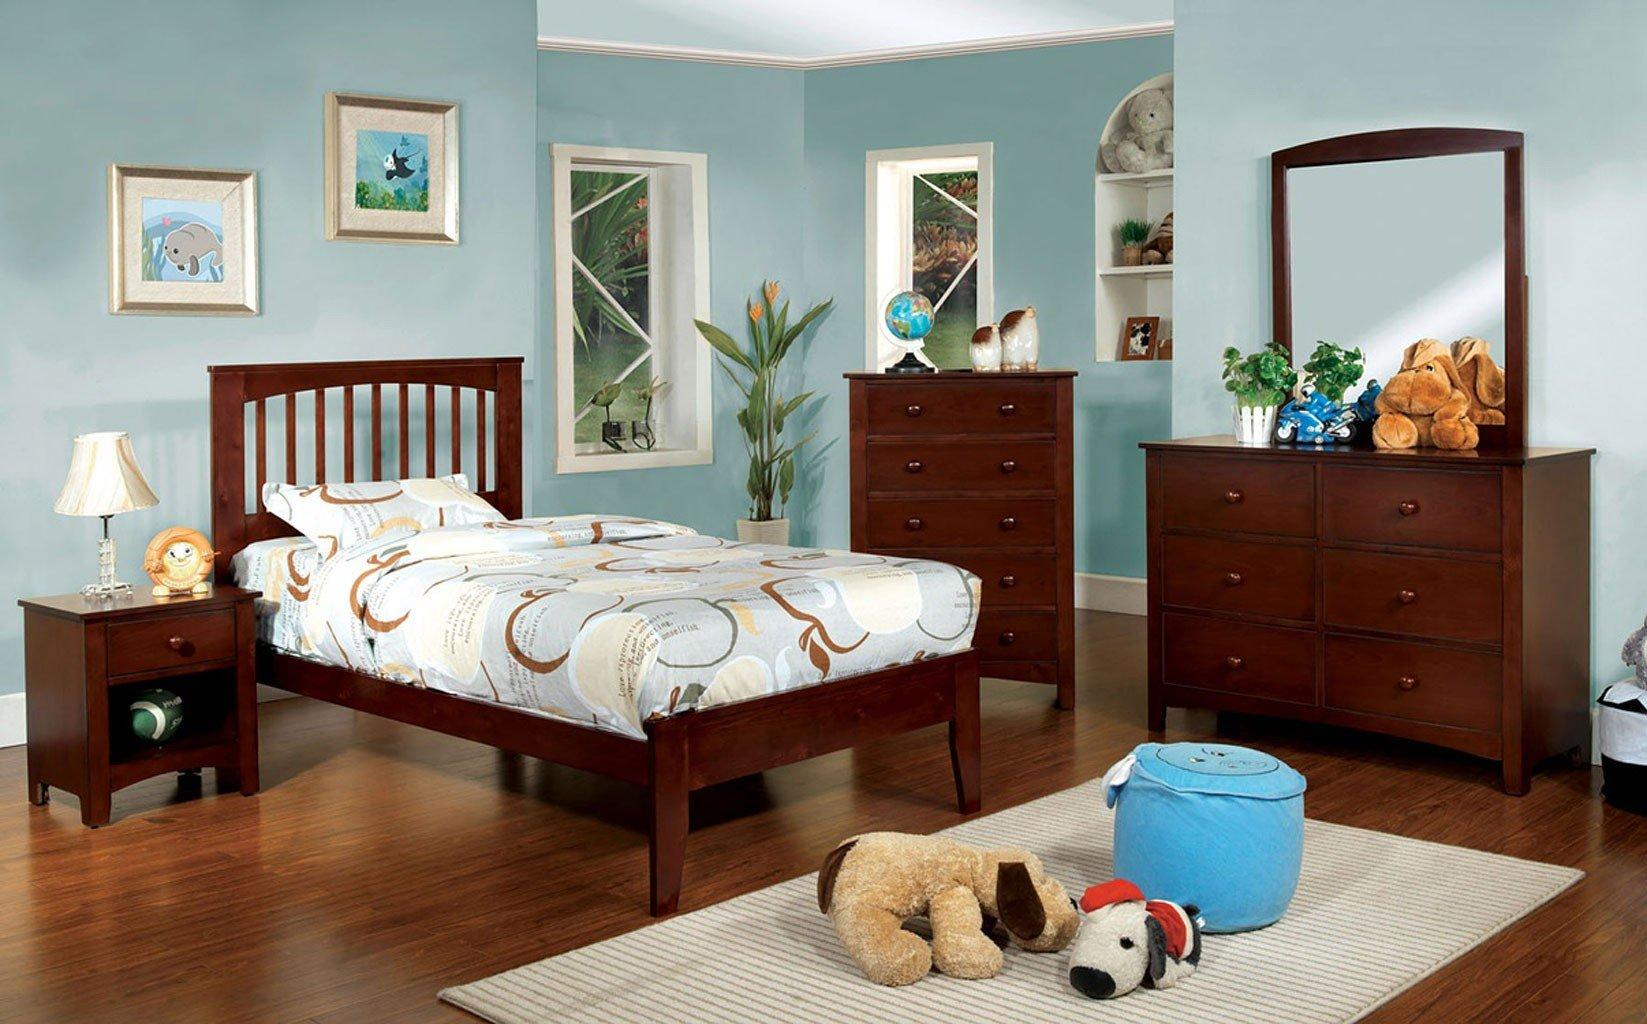 Omnus youth bedroom set w pine brook bed cherry - Childrens pine bedroom furniture ...